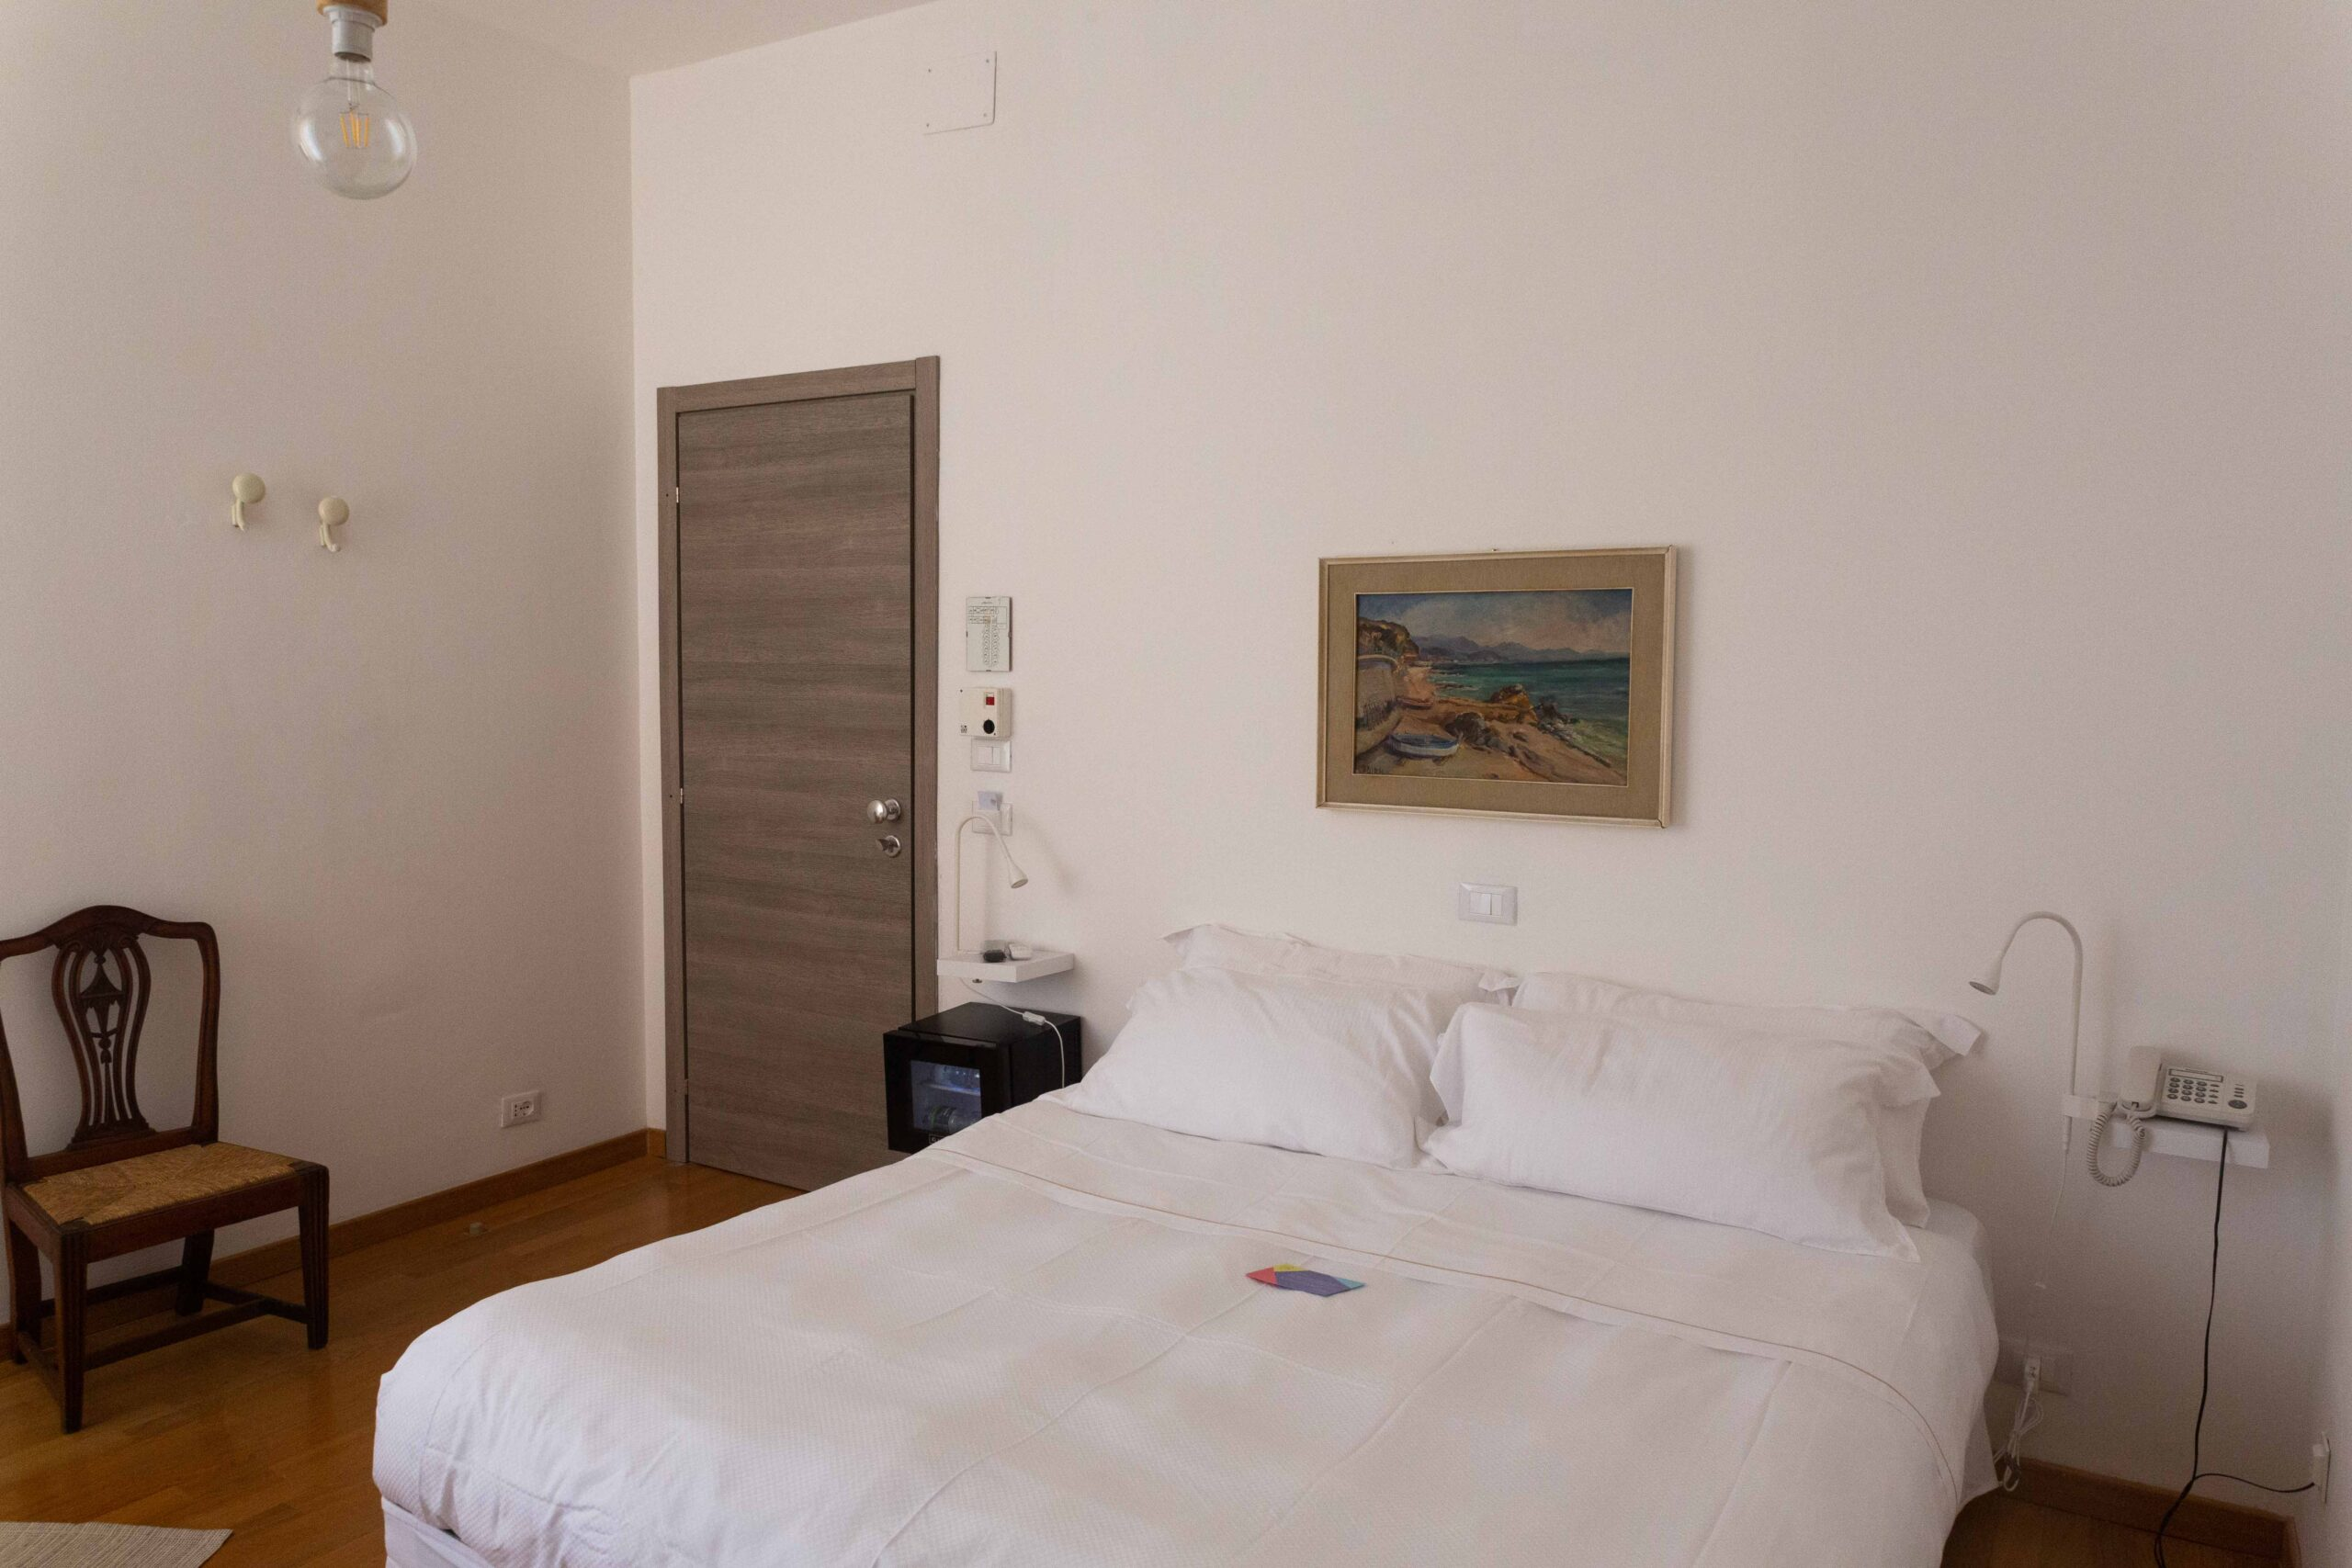 Standard XL Hotel San Michele 4 Stelle | San Michele Celle Ligure